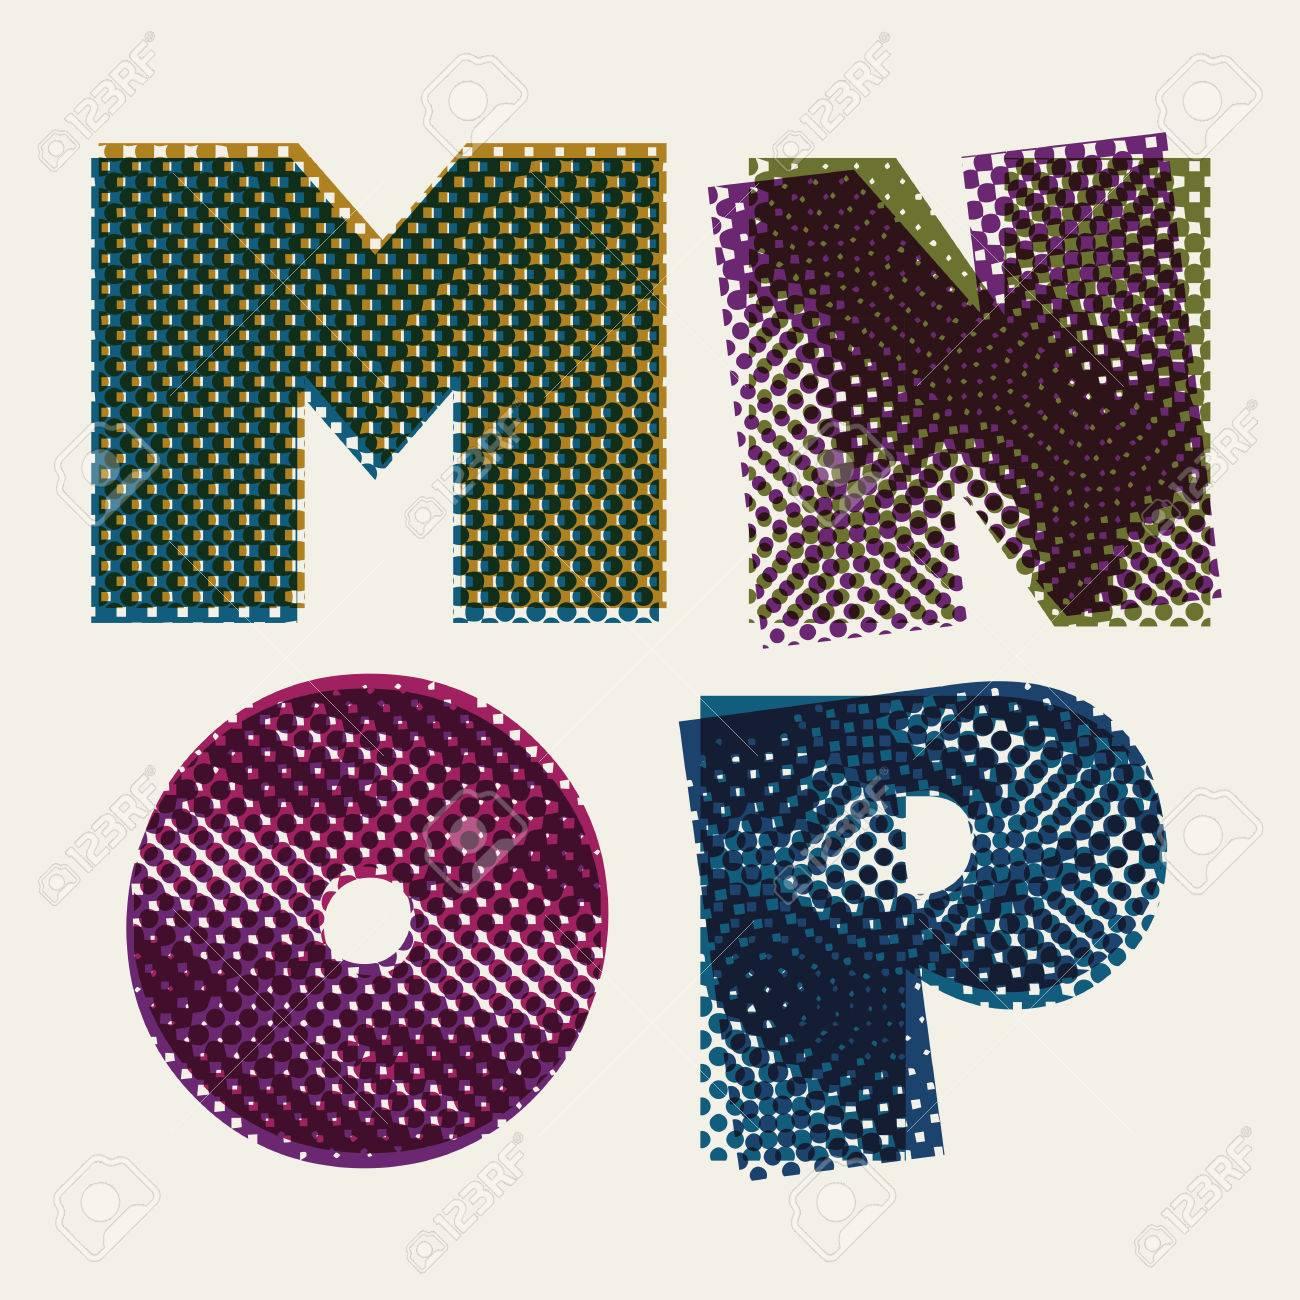 Color halftone printing - Halftone Dots Font Dirty Grunge Color Pixels Print Texture Letters Vector Alphabet Letters